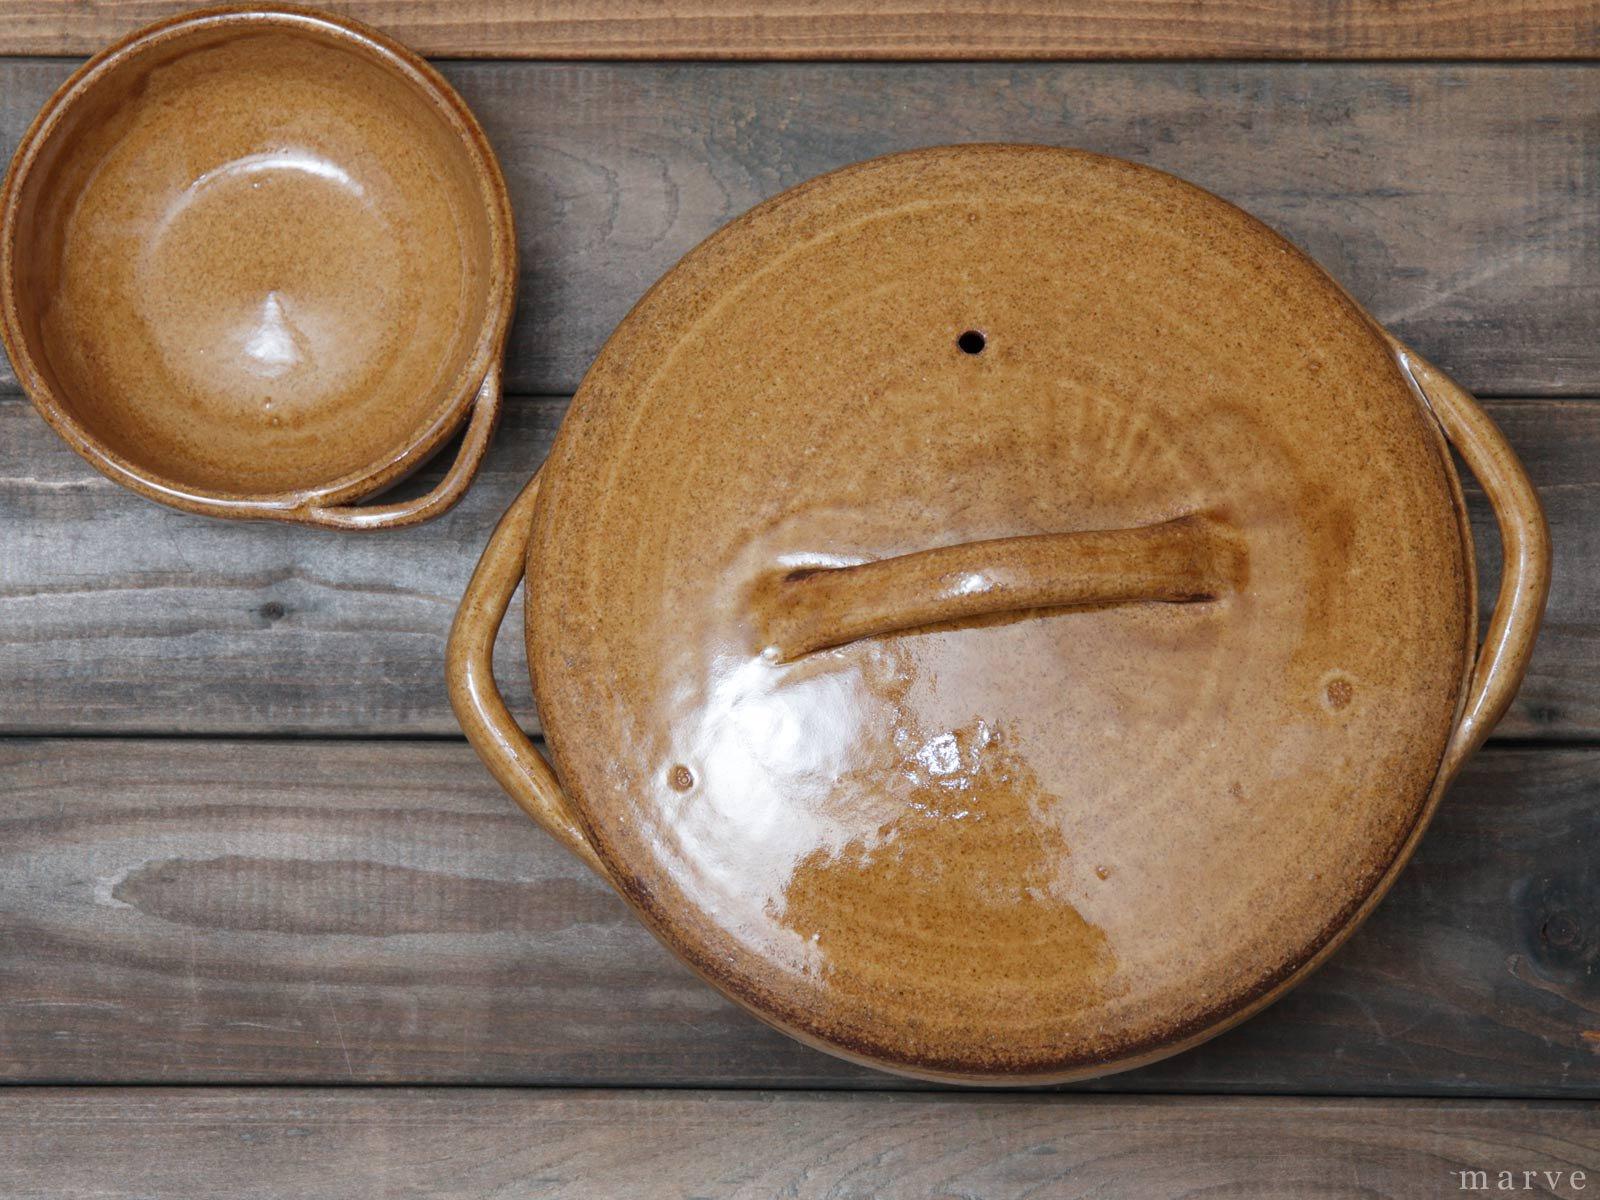 Cacerola(カセロラ) 土鍋 8号鍋 白/黄 4th-market